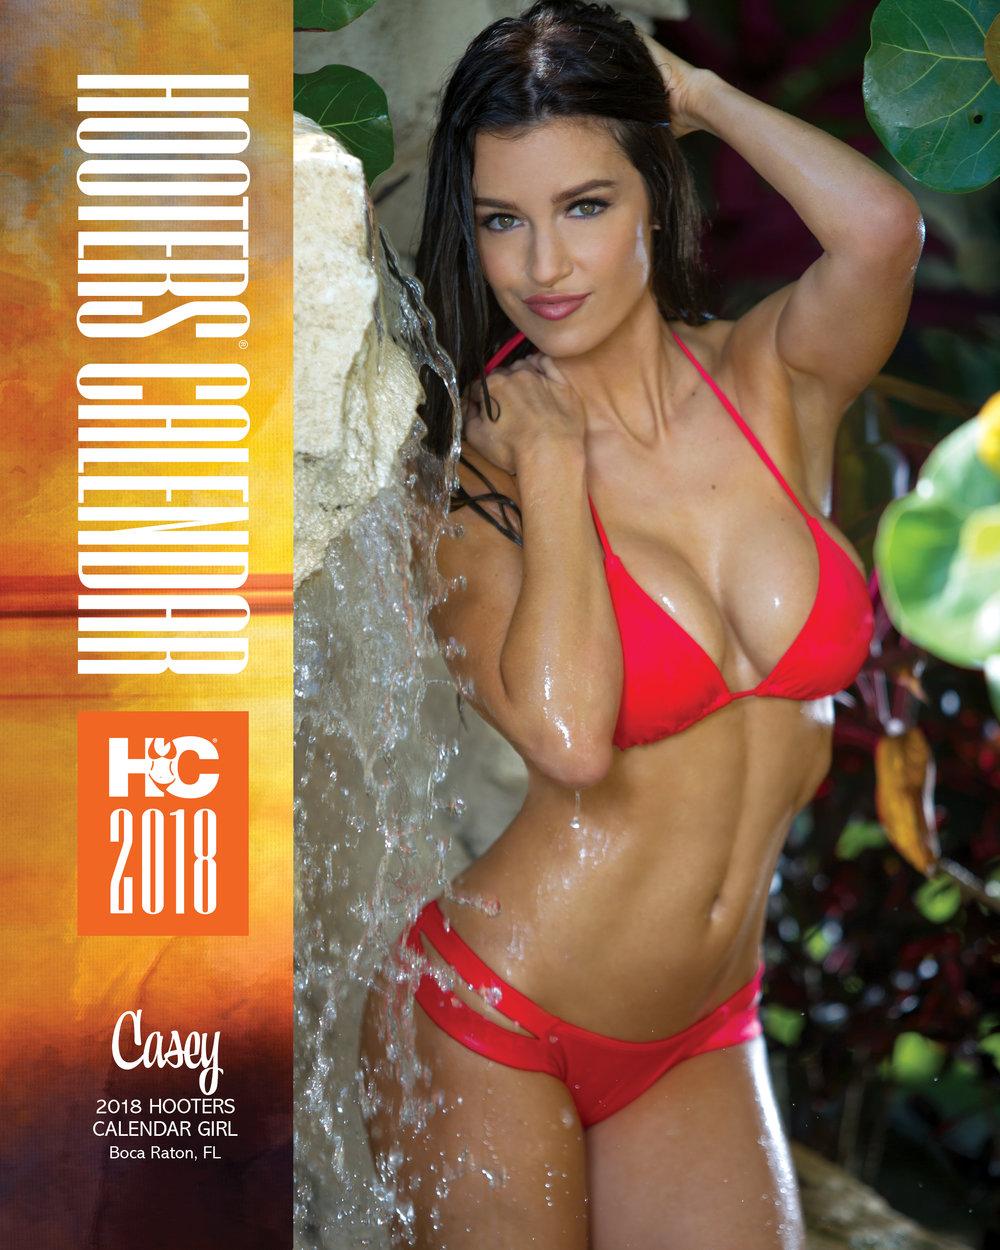 Casey_Hooters Calendar